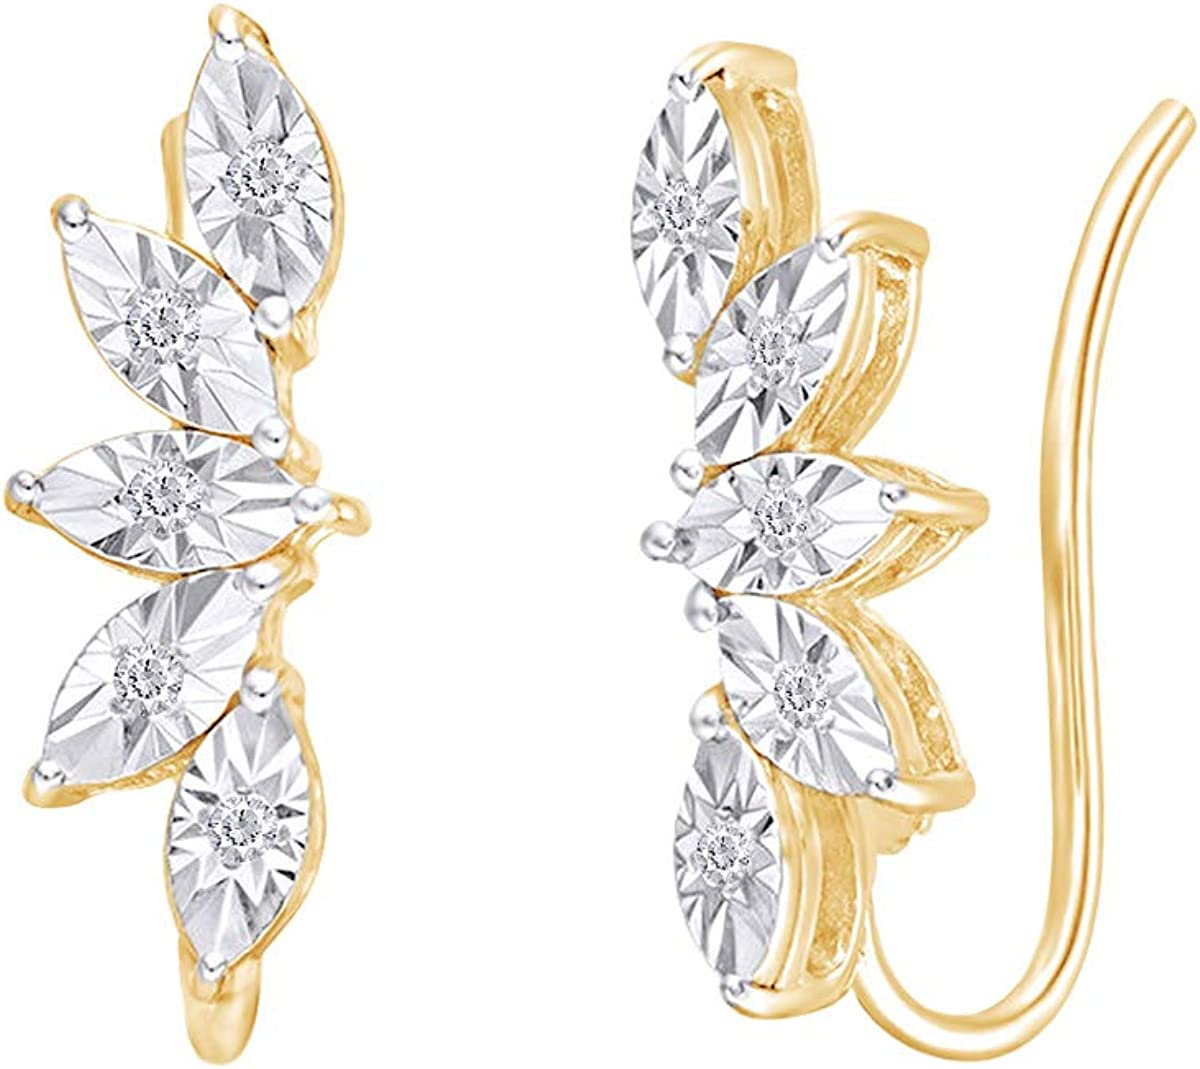 Samaira Jewelry Miracle List price Set Natural Diamond Crawler Leaf Fan Ear 5 popular